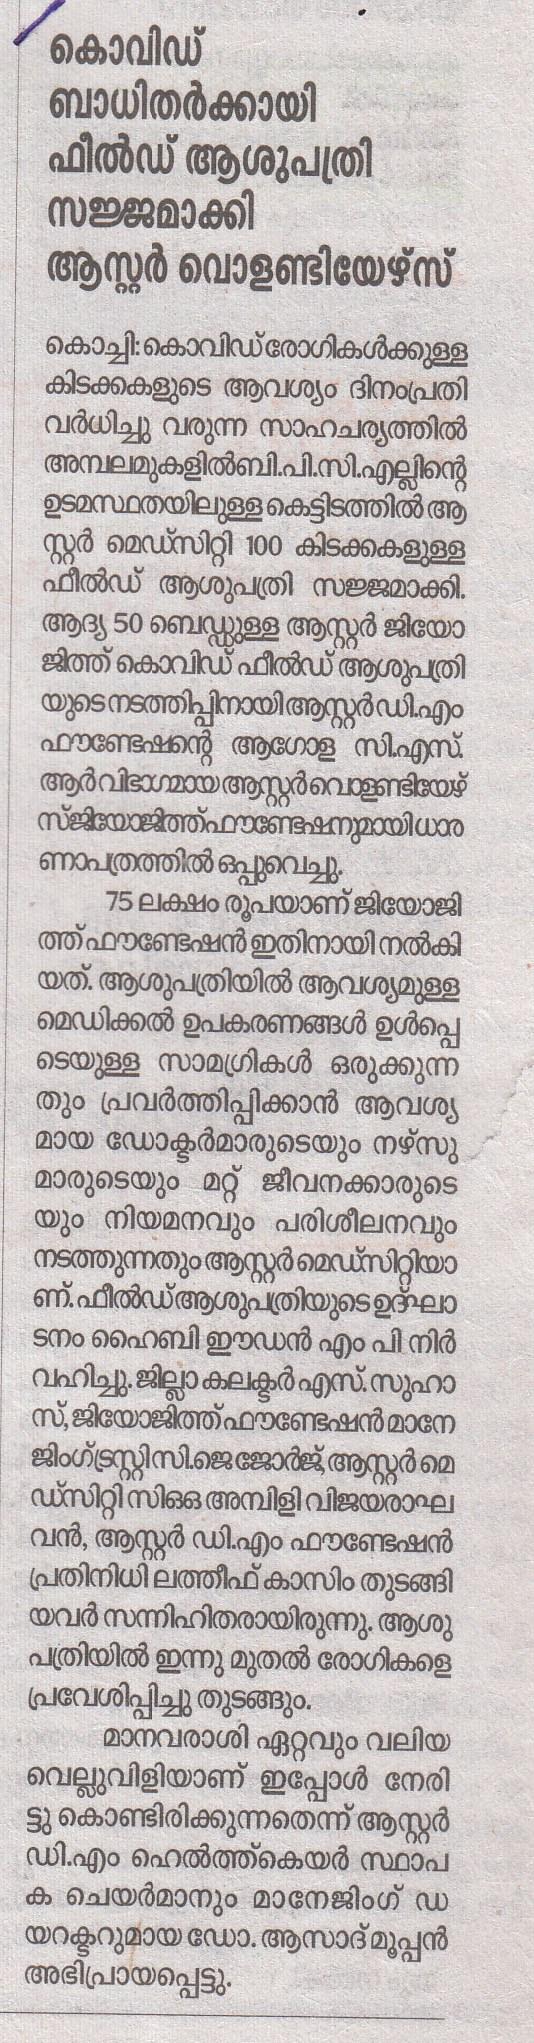 19 05 21 Suprabhatham pg 3